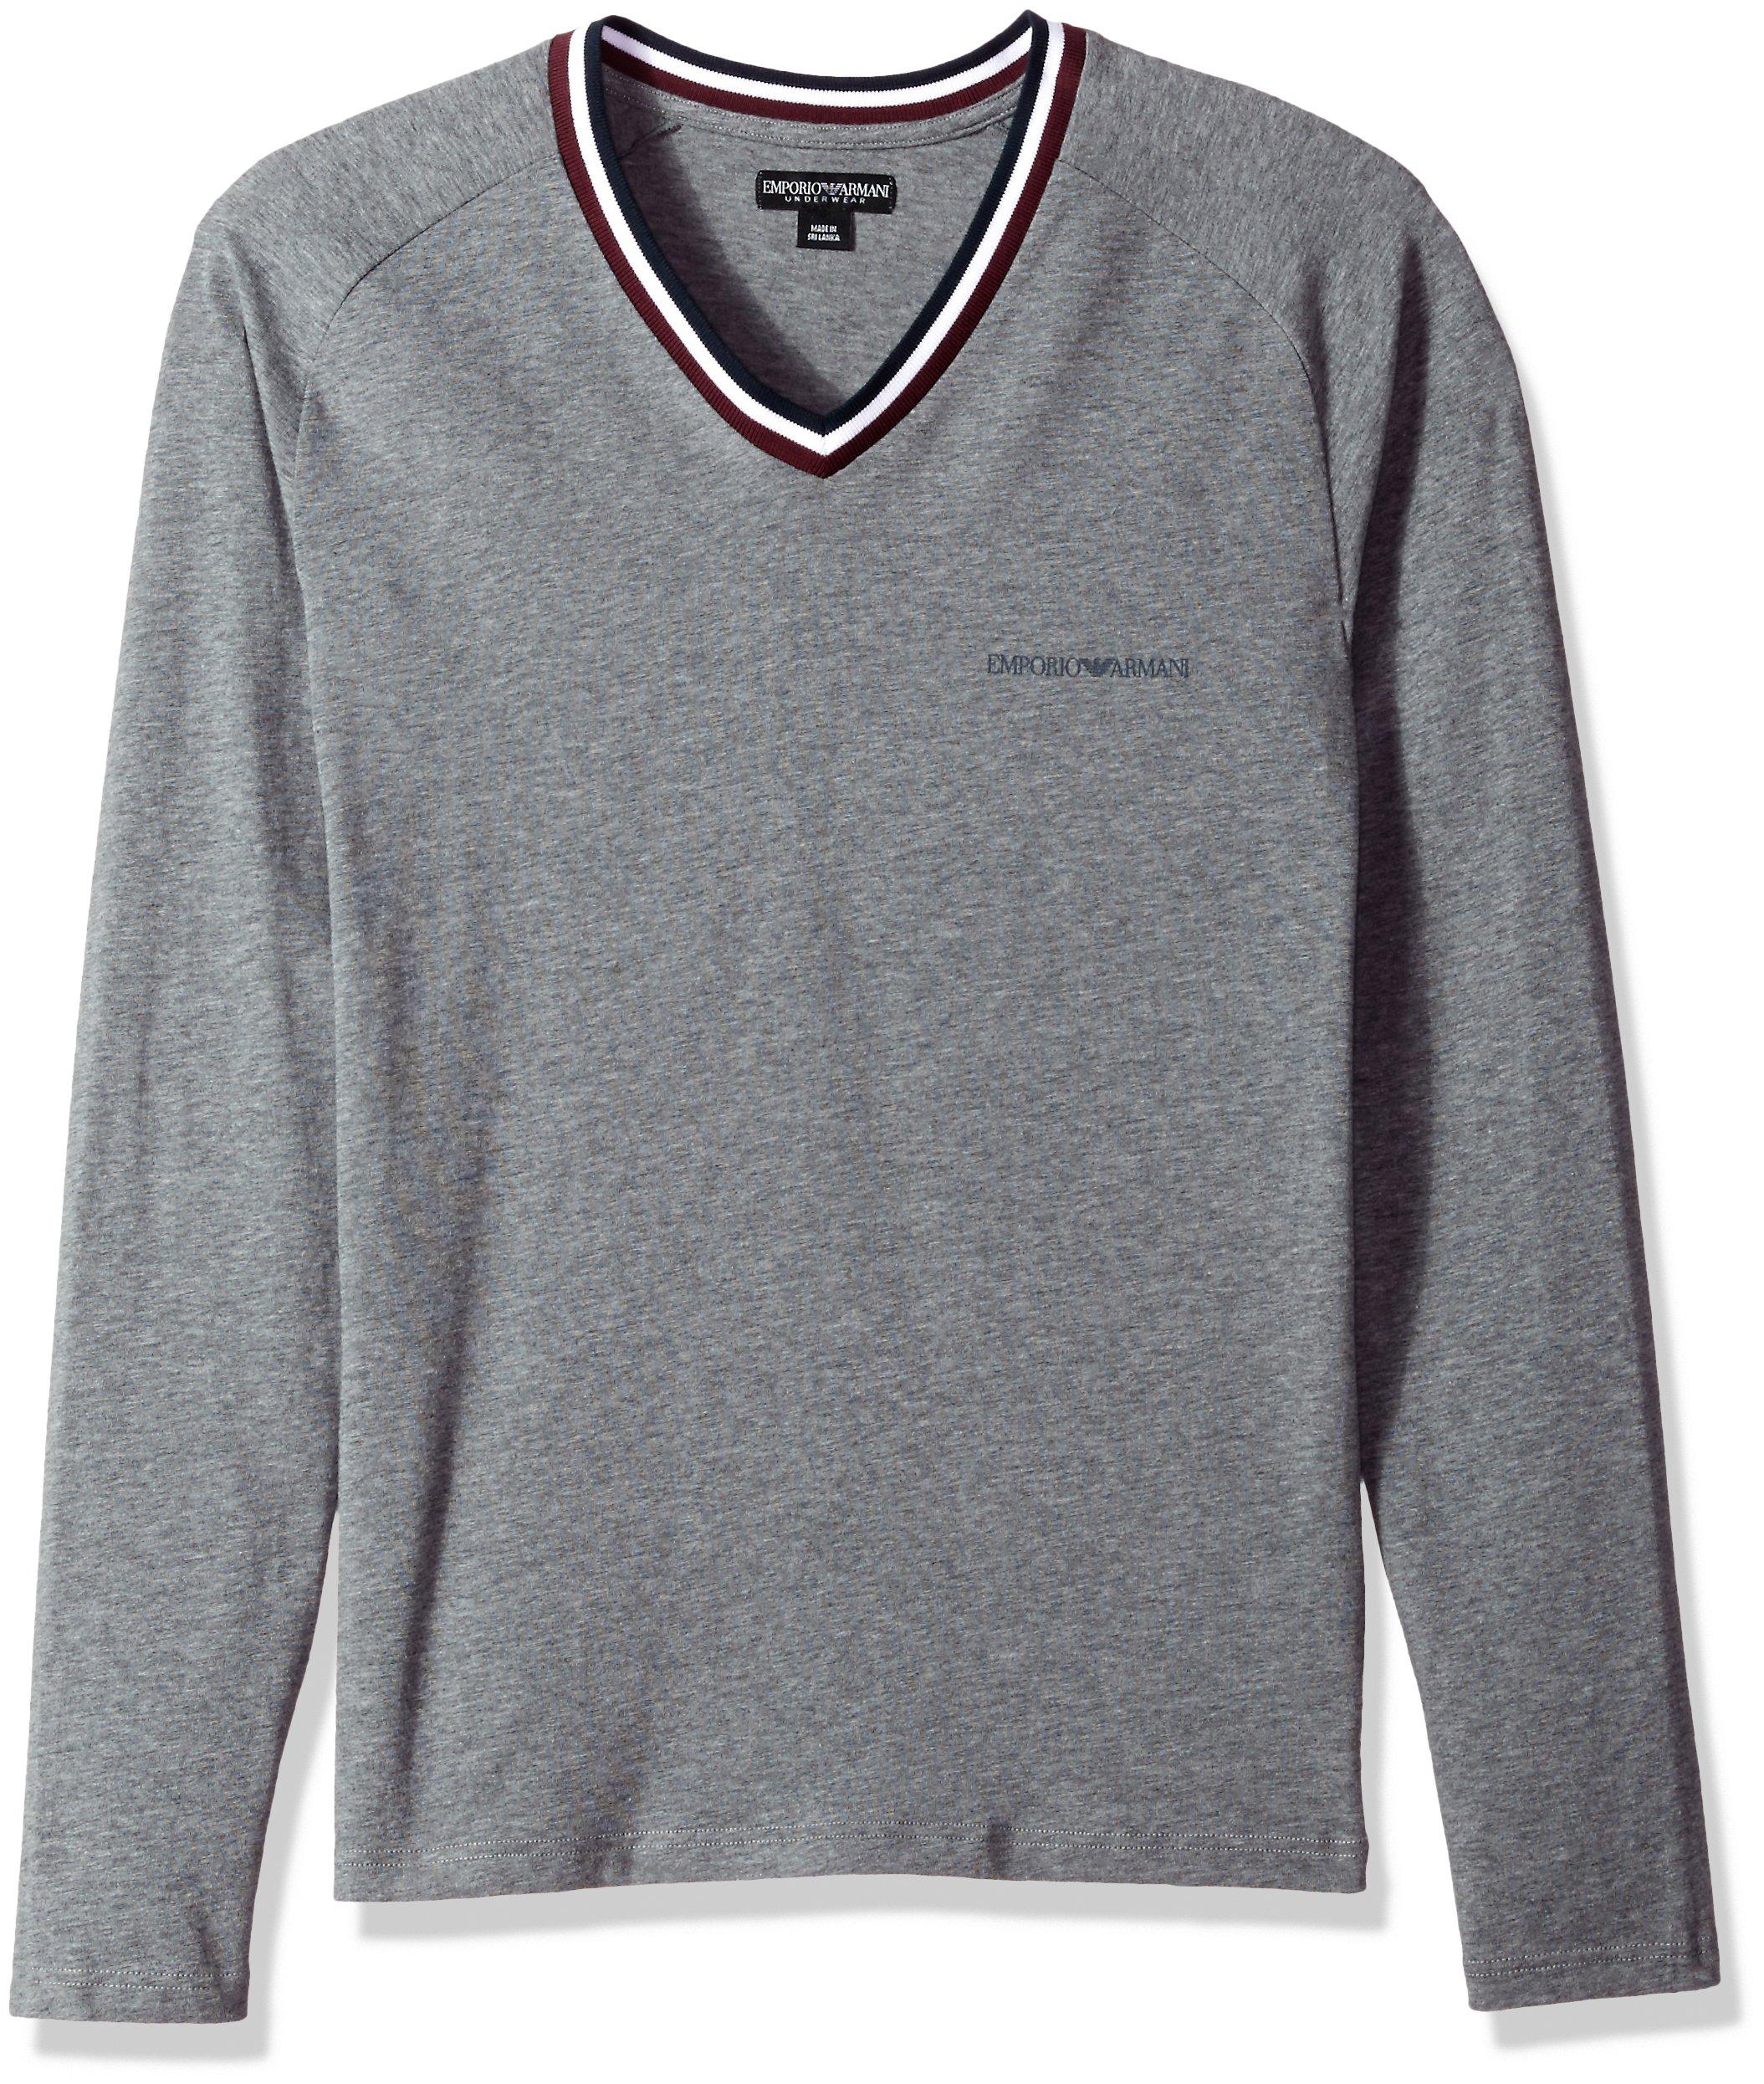 Emporio Armani Men's Rugby Player L/s Vneck T-Shirt, Dark Gray, L